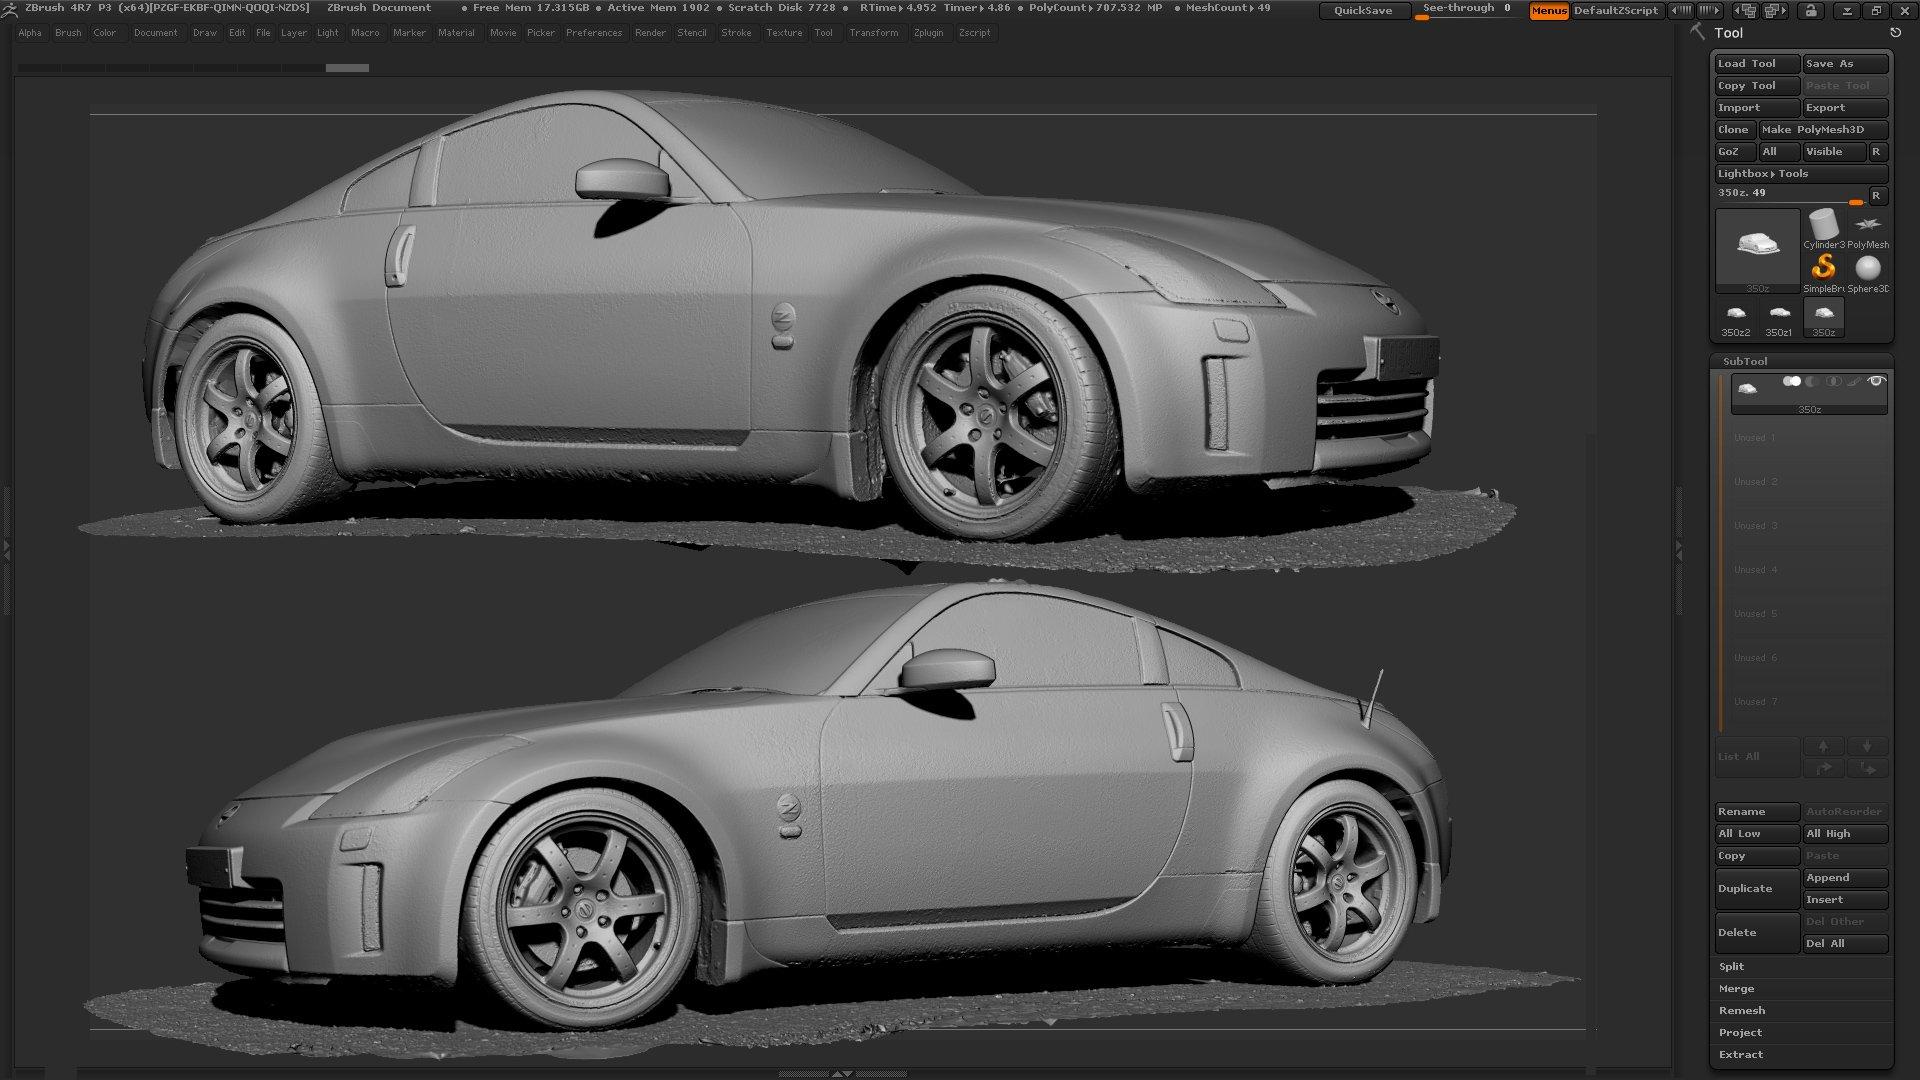 3d scanning cars with photogrammetry. Black Bedroom Furniture Sets. Home Design Ideas